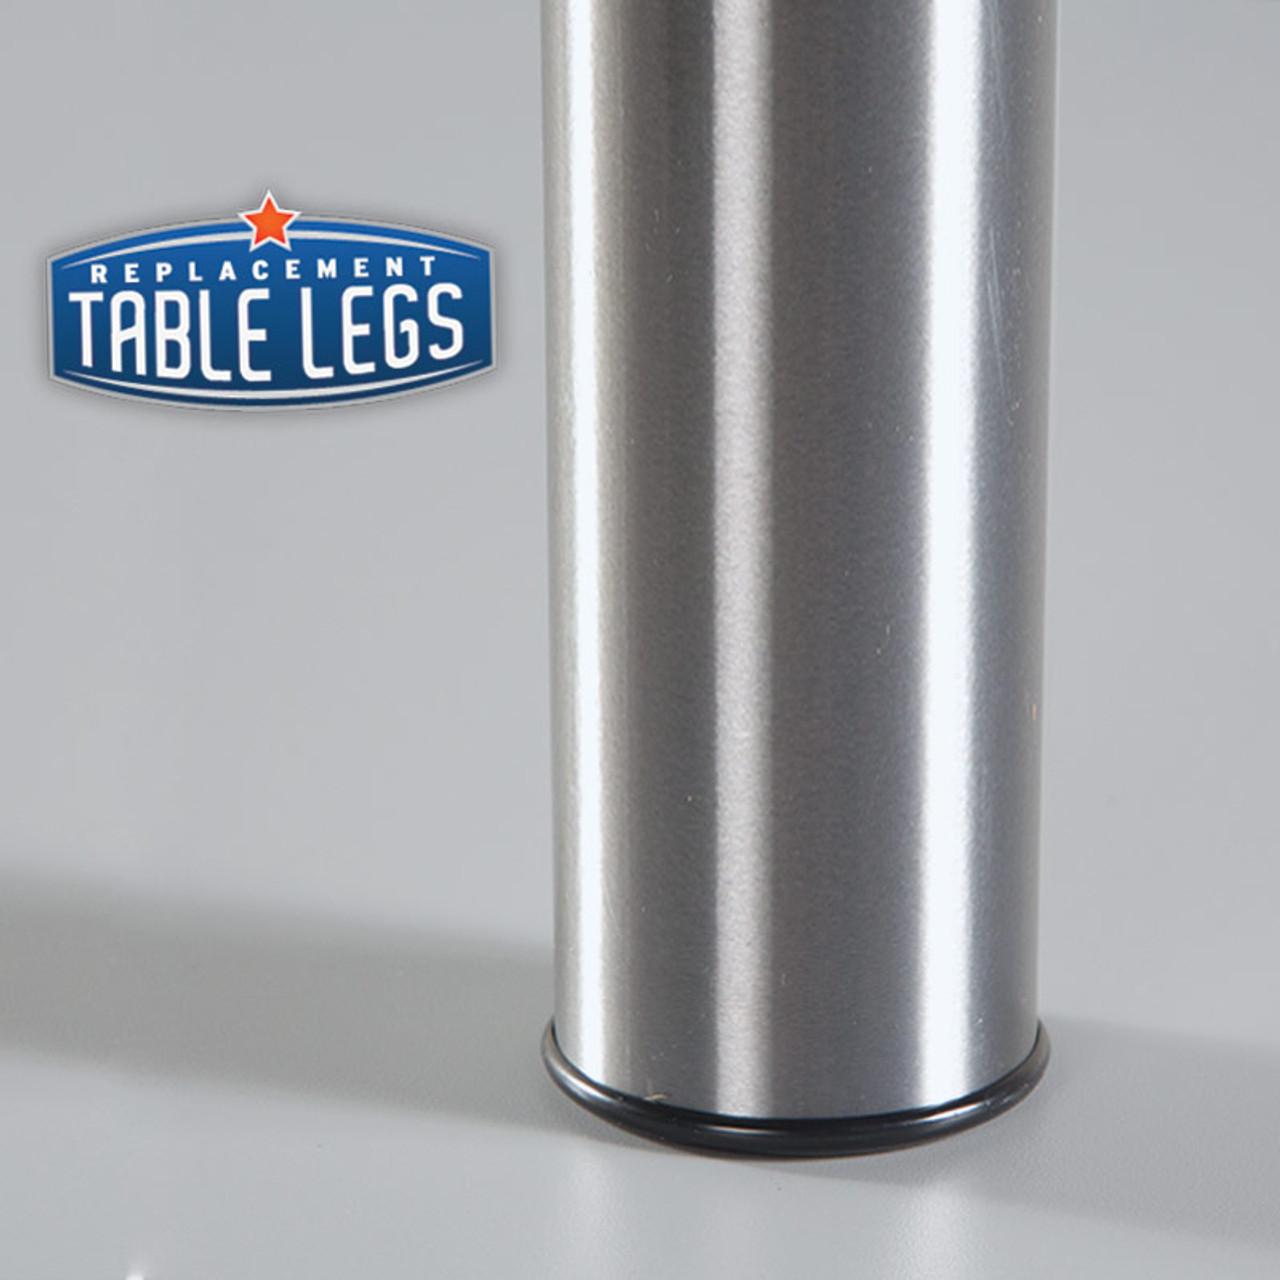 Brushed Steel Studio Telescoping Table Leg foot cover detail  - replacementtablelegs.com